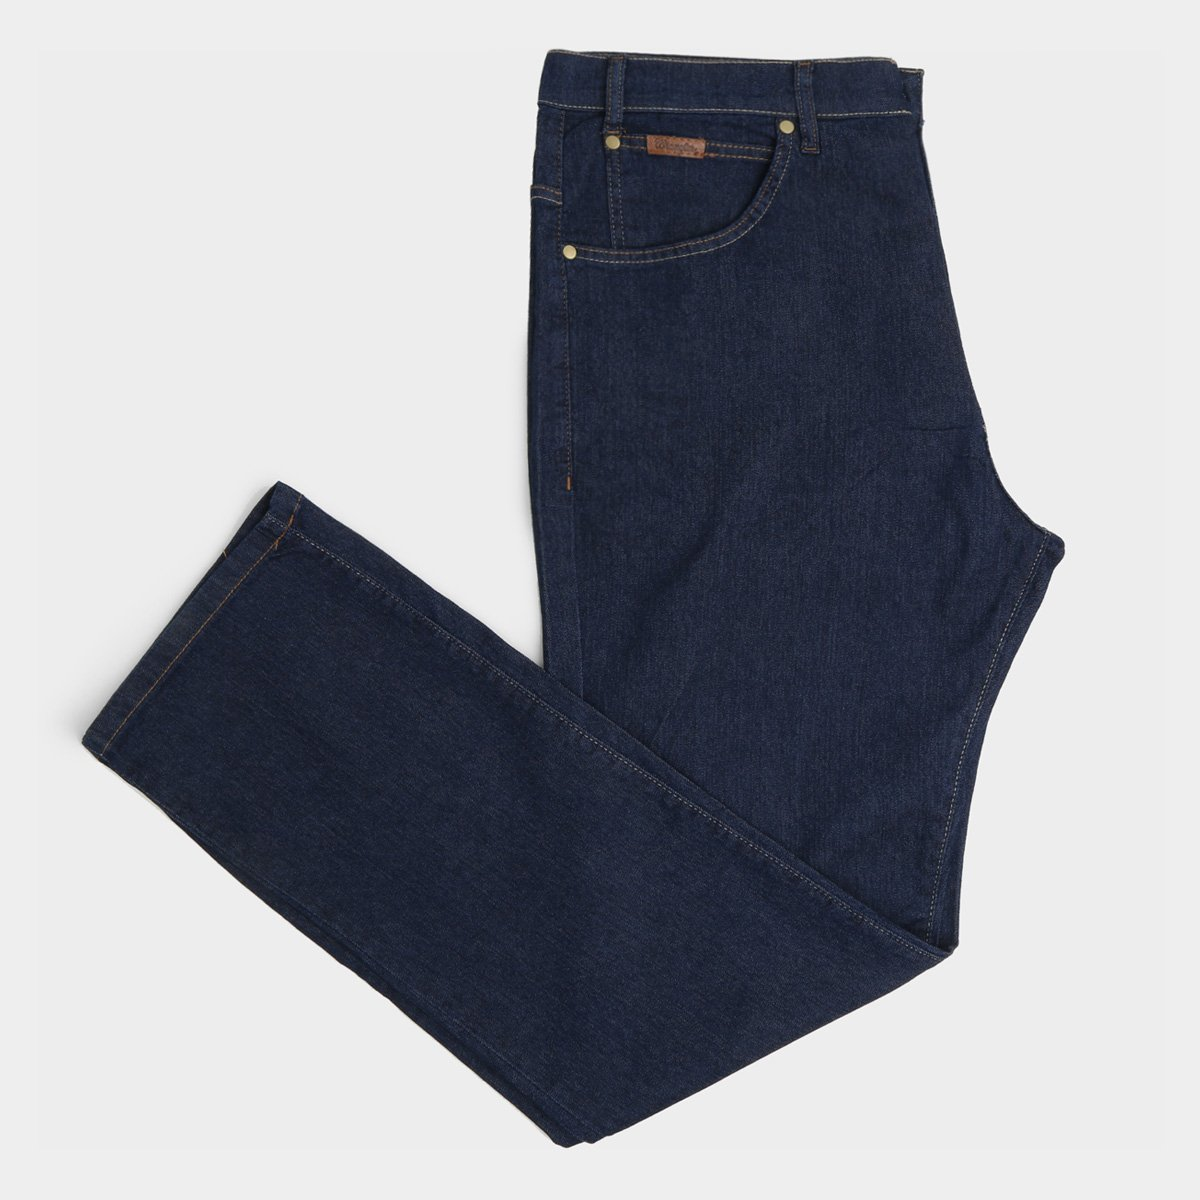 Calça Jeans Slim Plus Size Wrangler Masculina